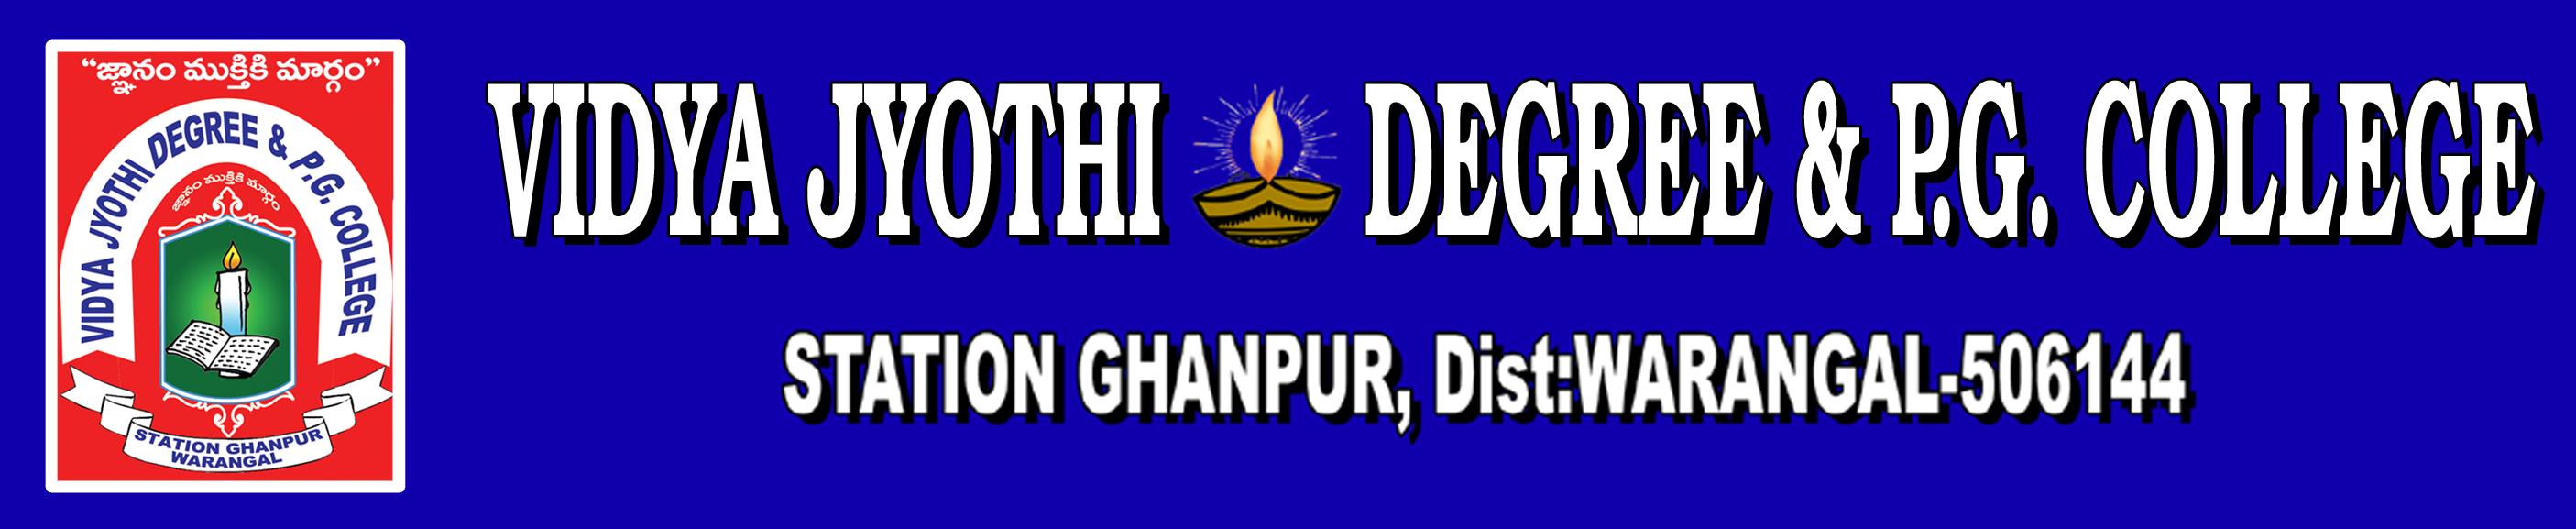 VJDPGC-Vidya Jyothi Degree and PG College